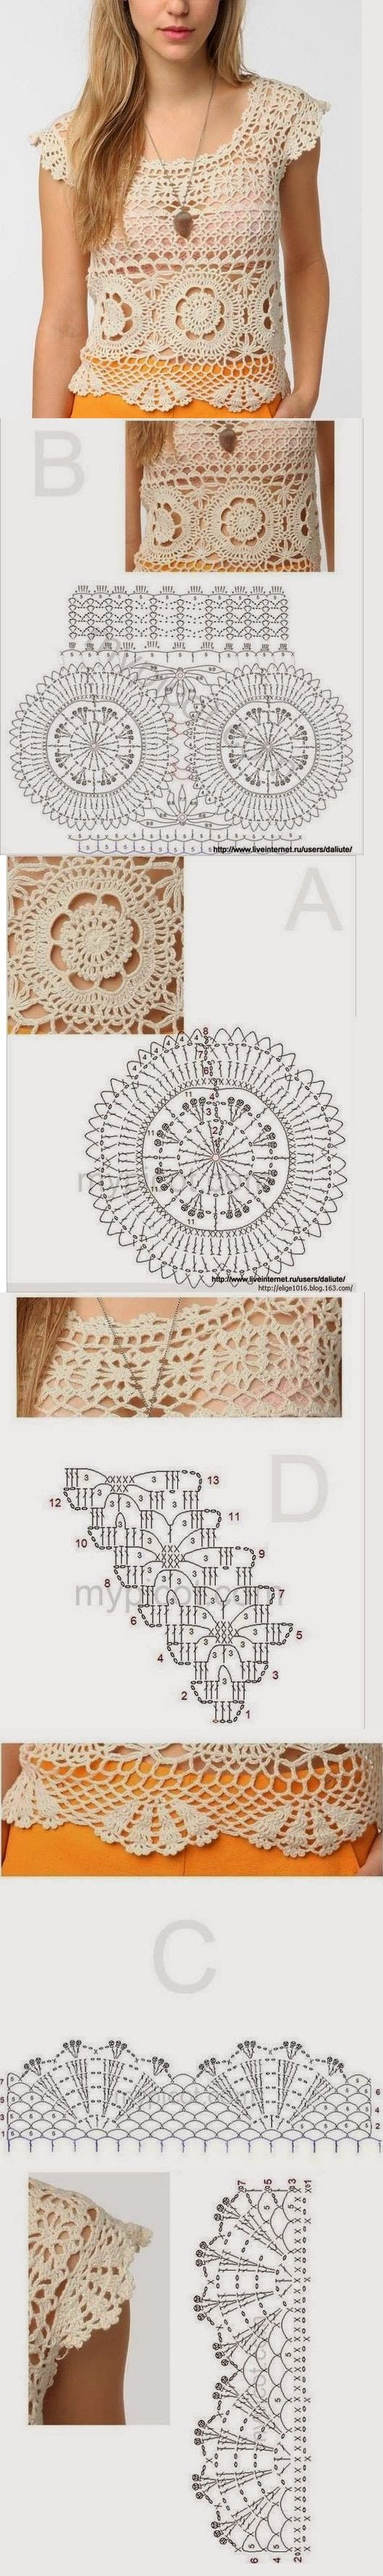 picture only/floral crochet motif